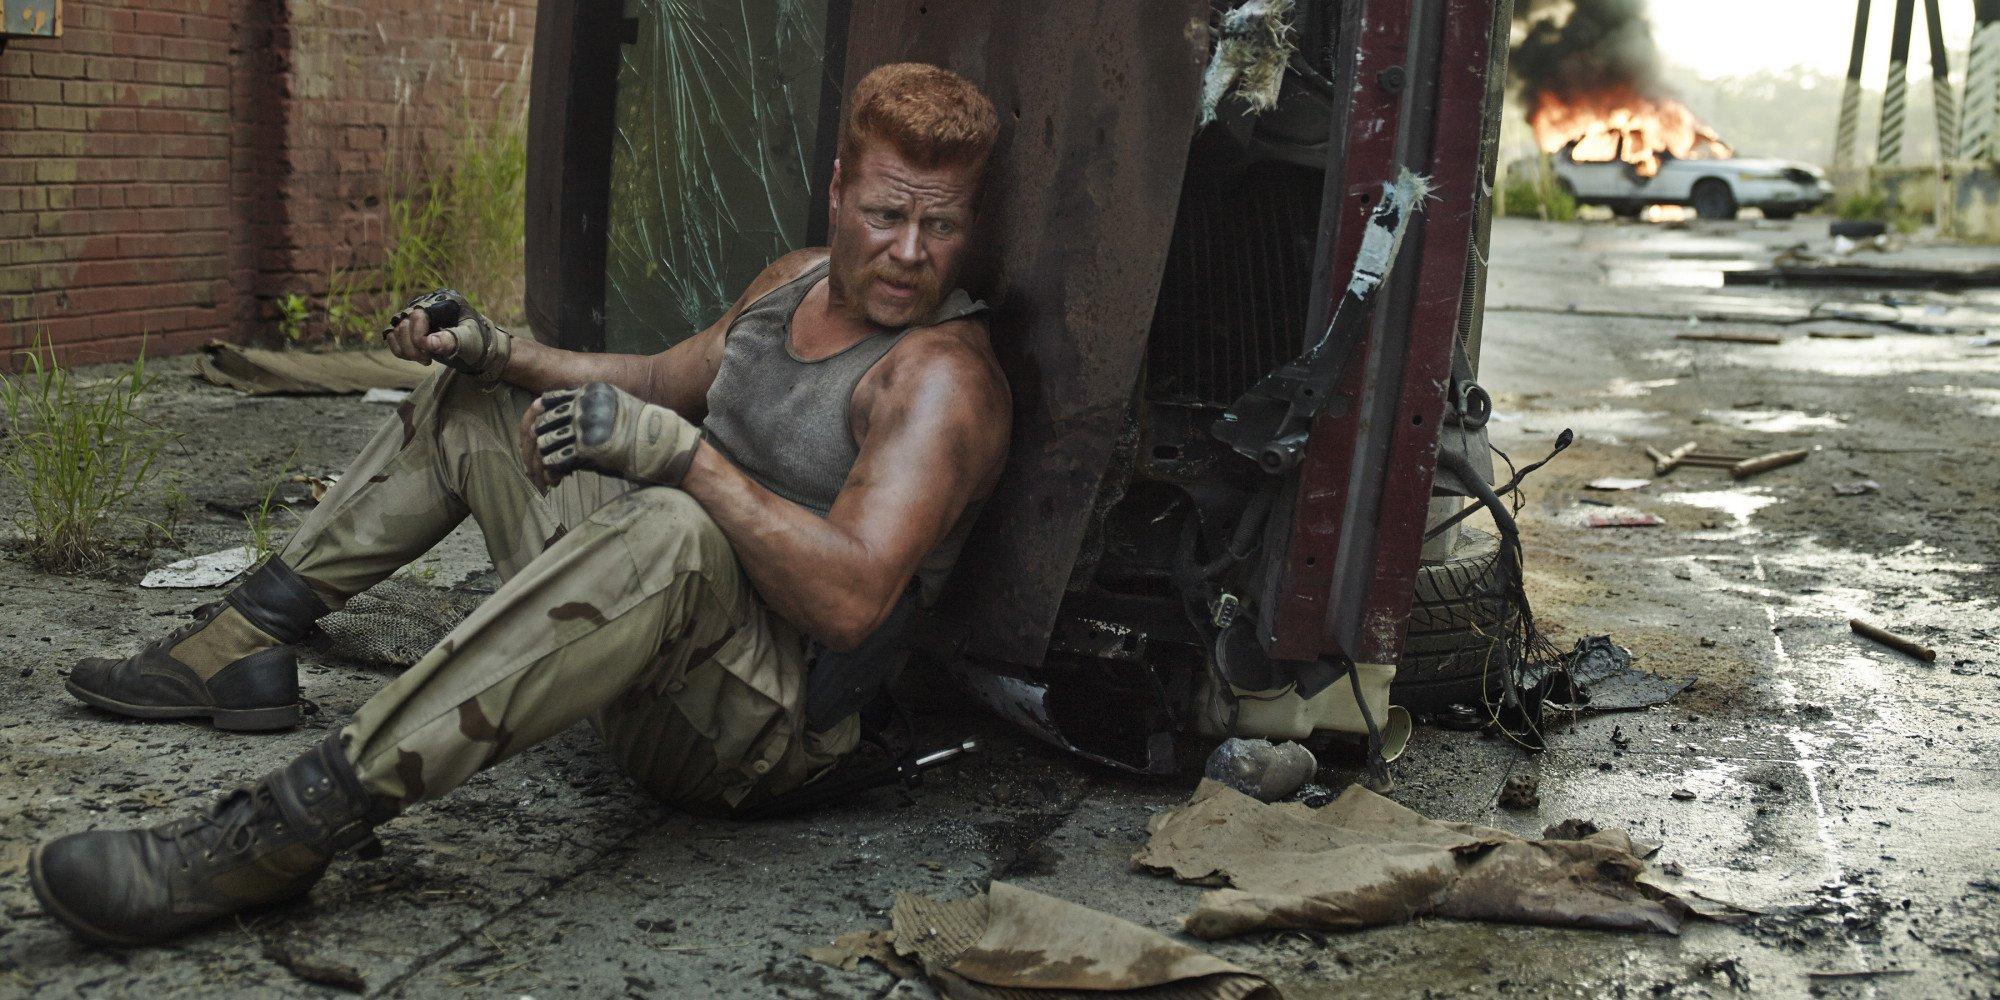 The Walking Dead's Michale Cudlitz reveals awkward mishap during sex scene